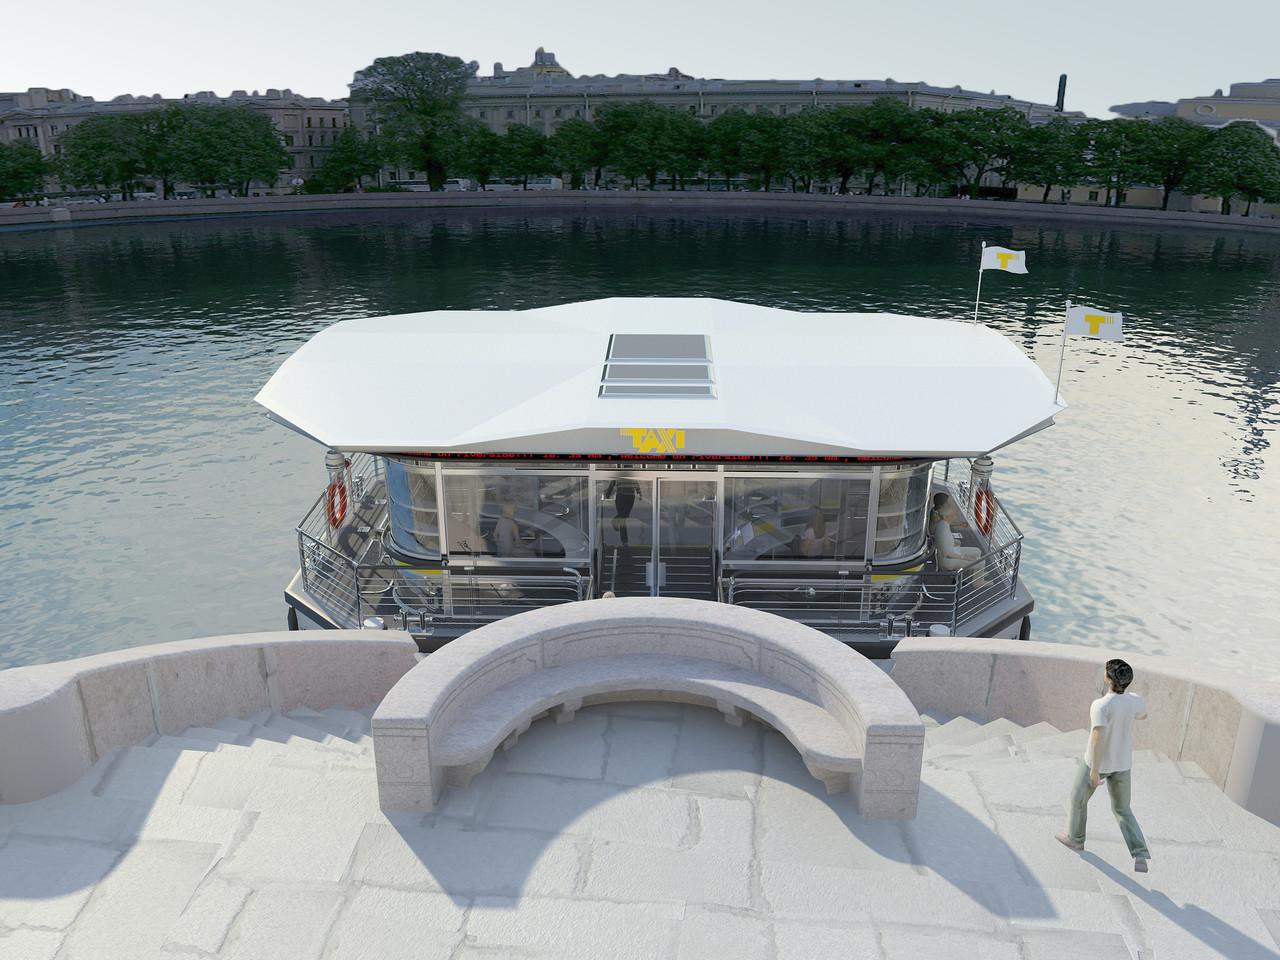 Креативный проект причала для водного такси СПБ